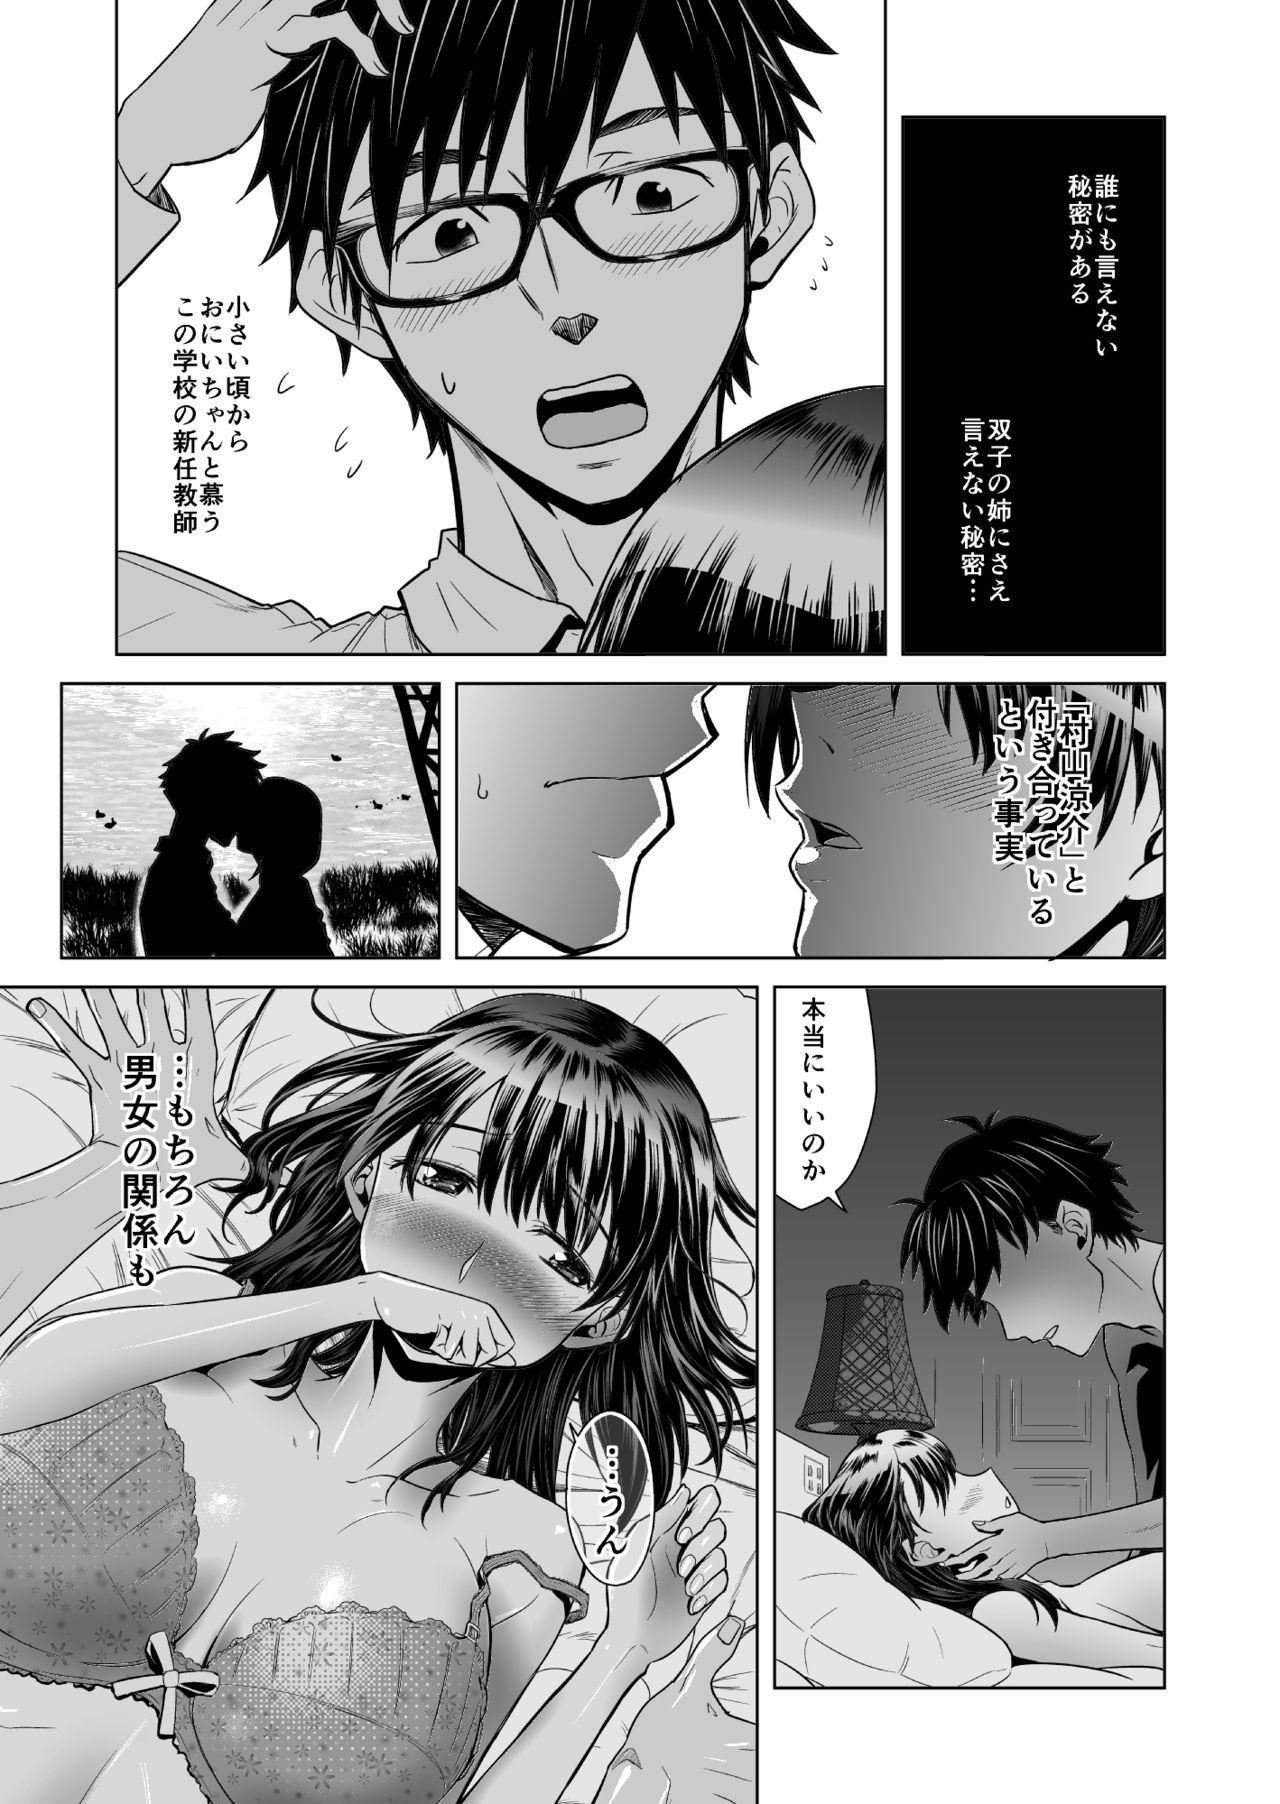 Akaneiro no Joukei 3